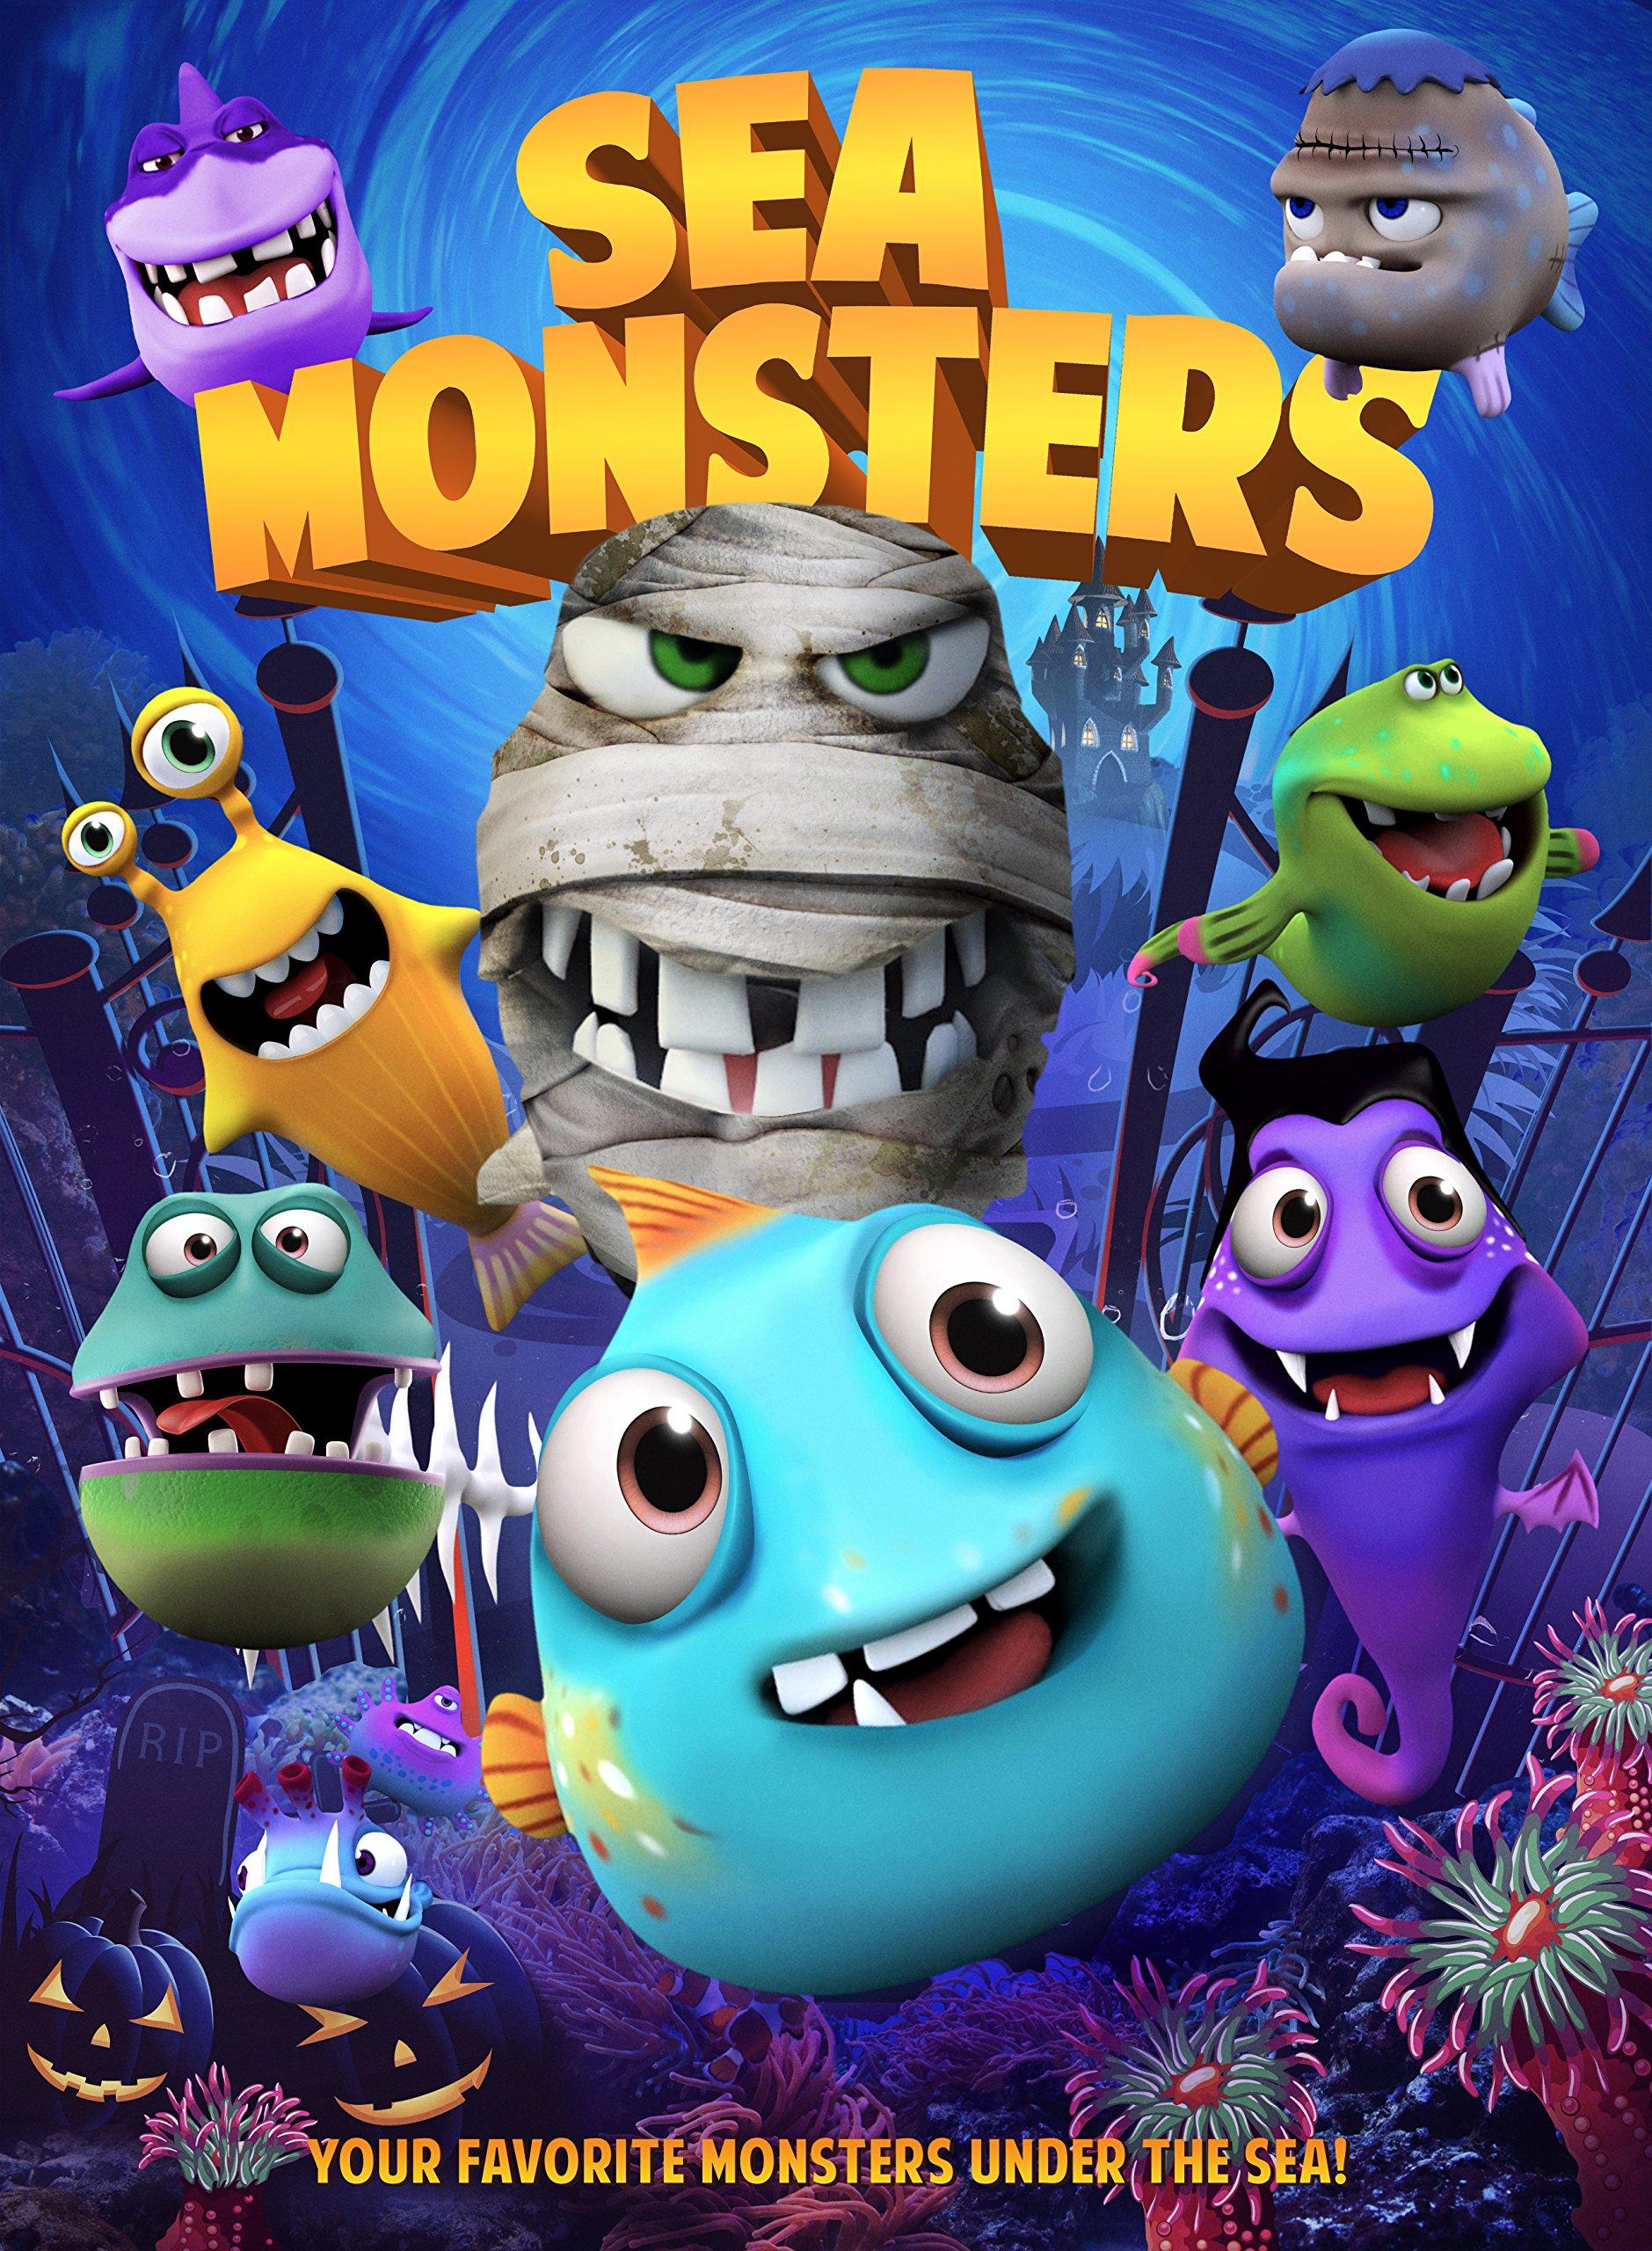 DVD : Sea Monsters (DVD)